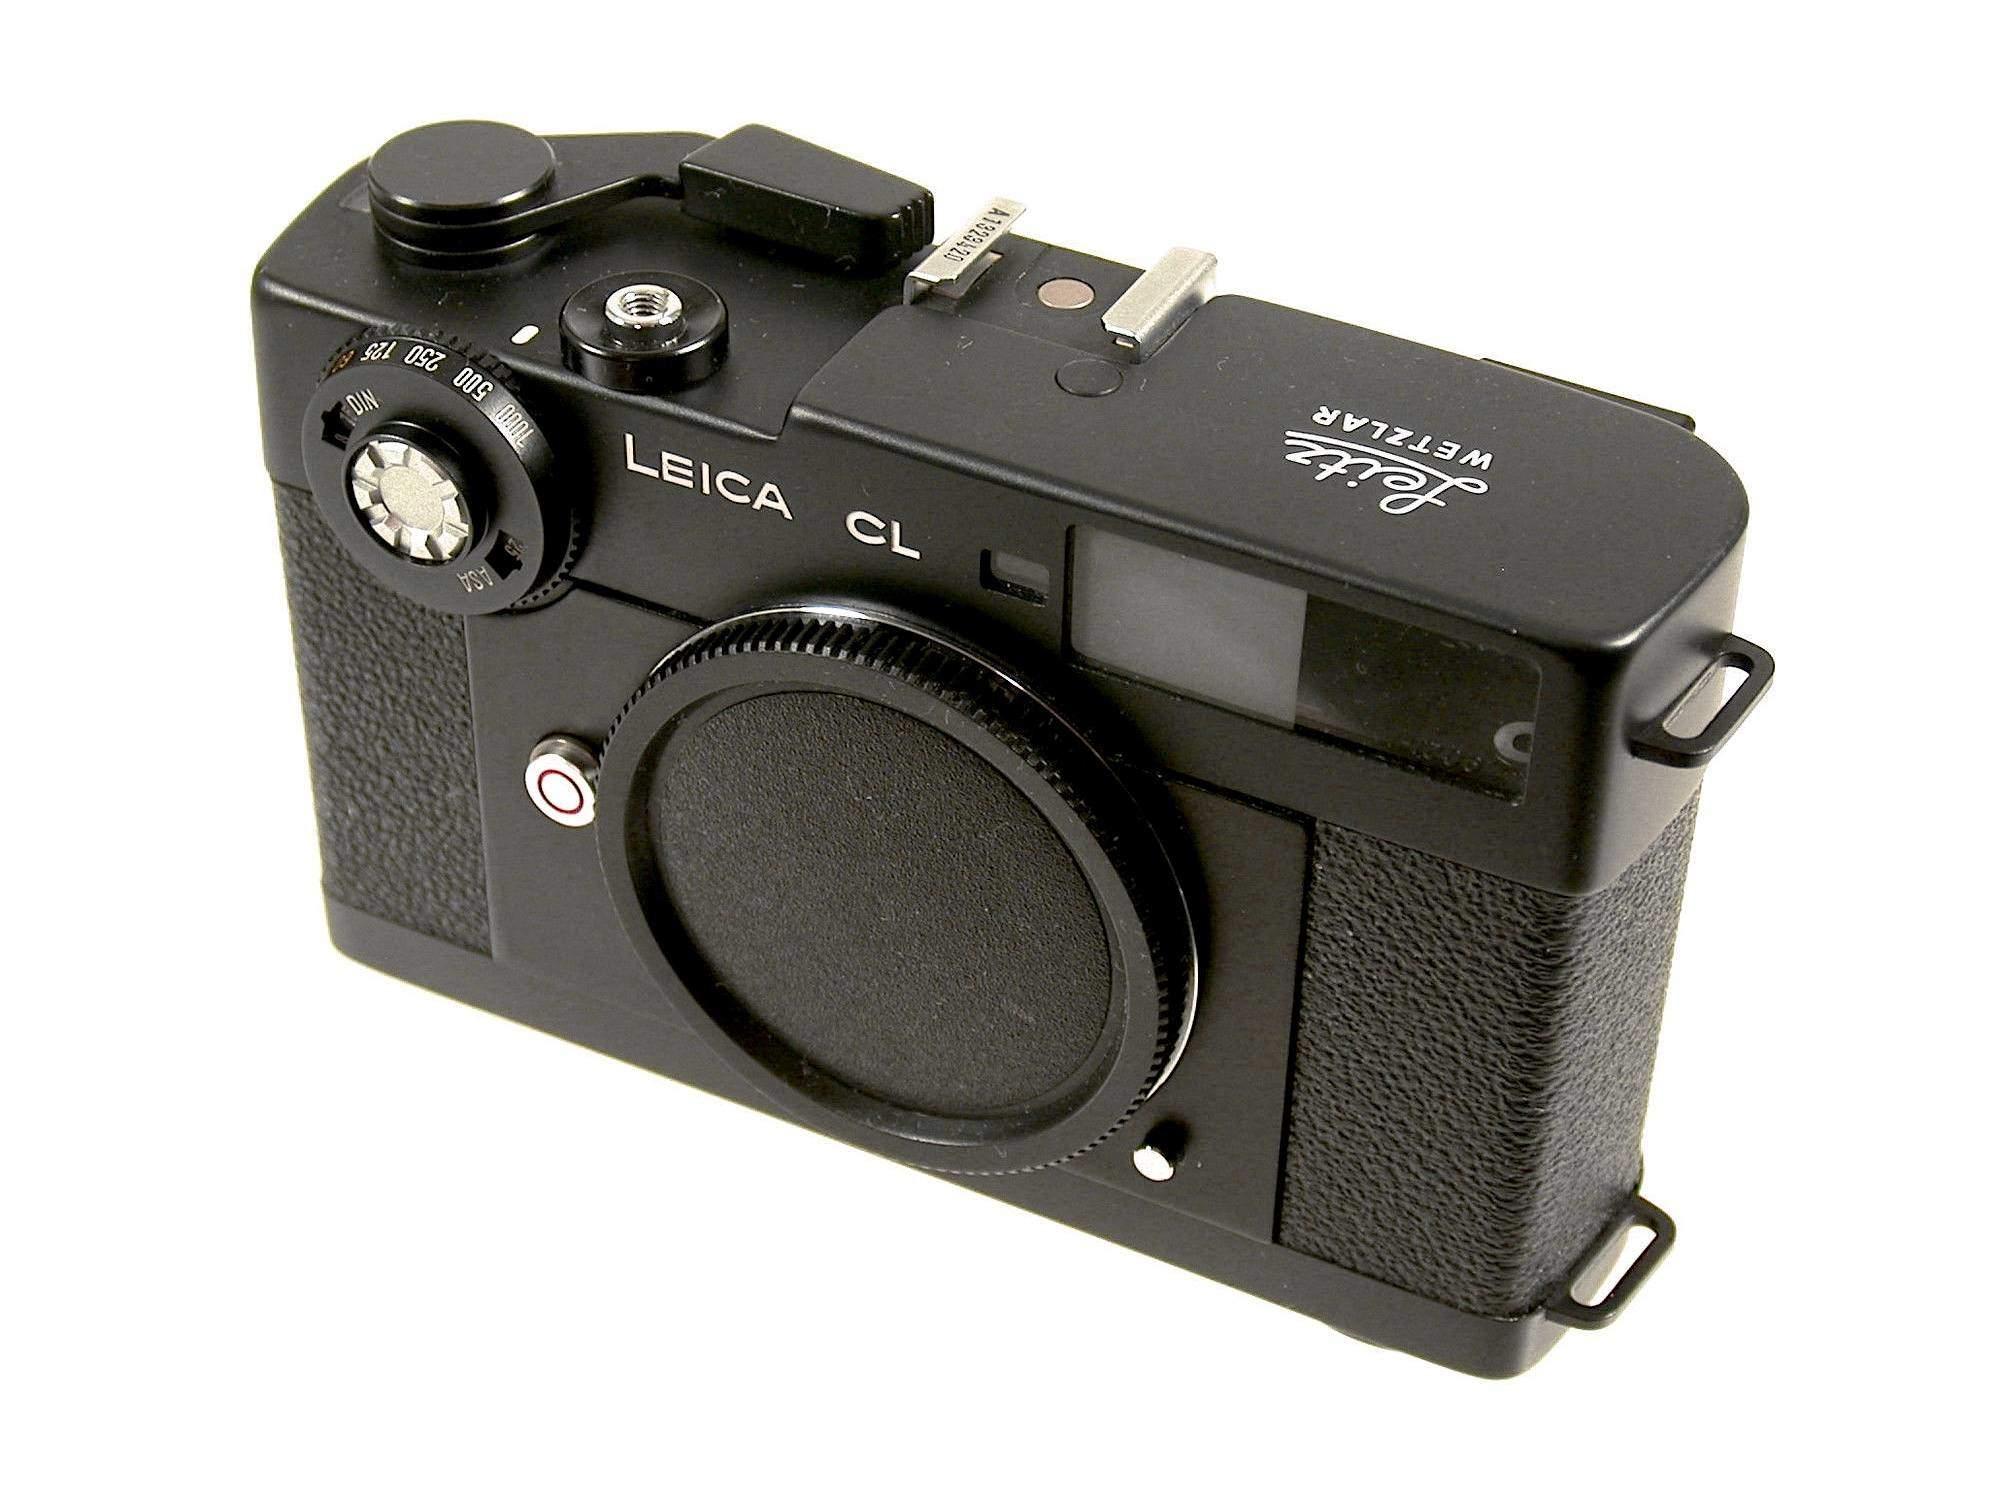 Leica CL RULLINO